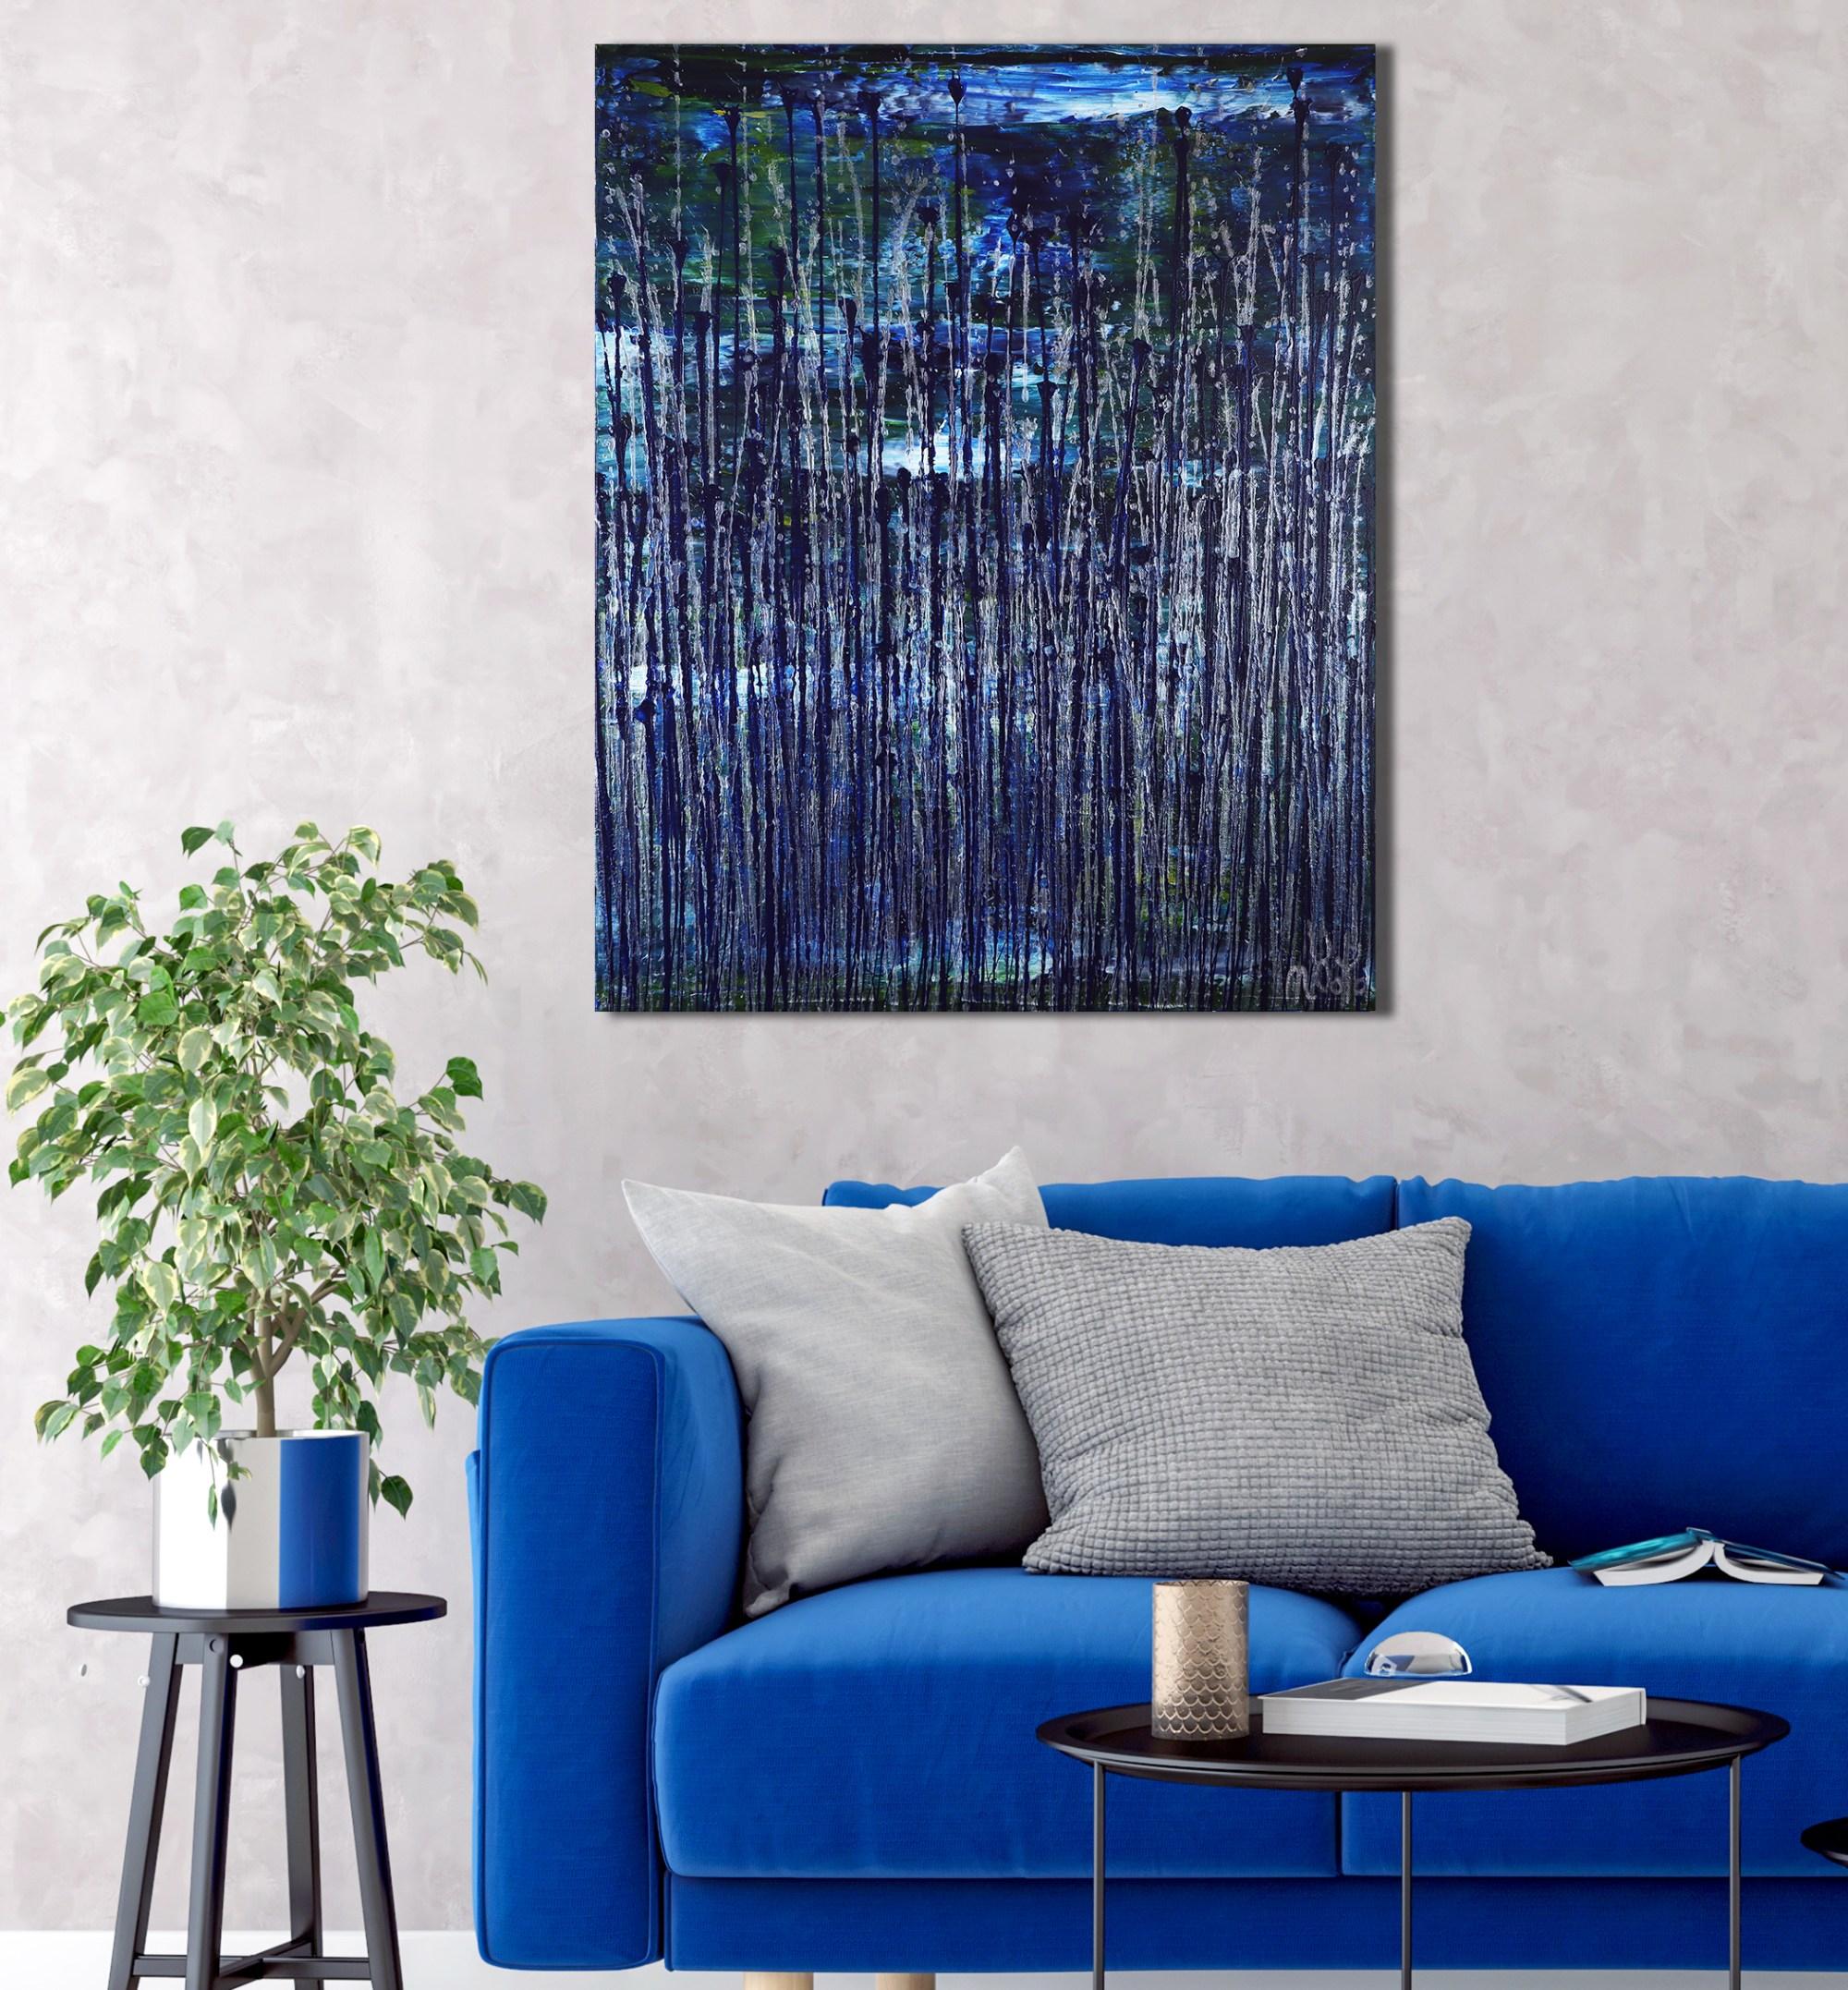 Room example / Nighttime Fearlessness 5 (2021) 24x30 in / Artist: Nestor Toro